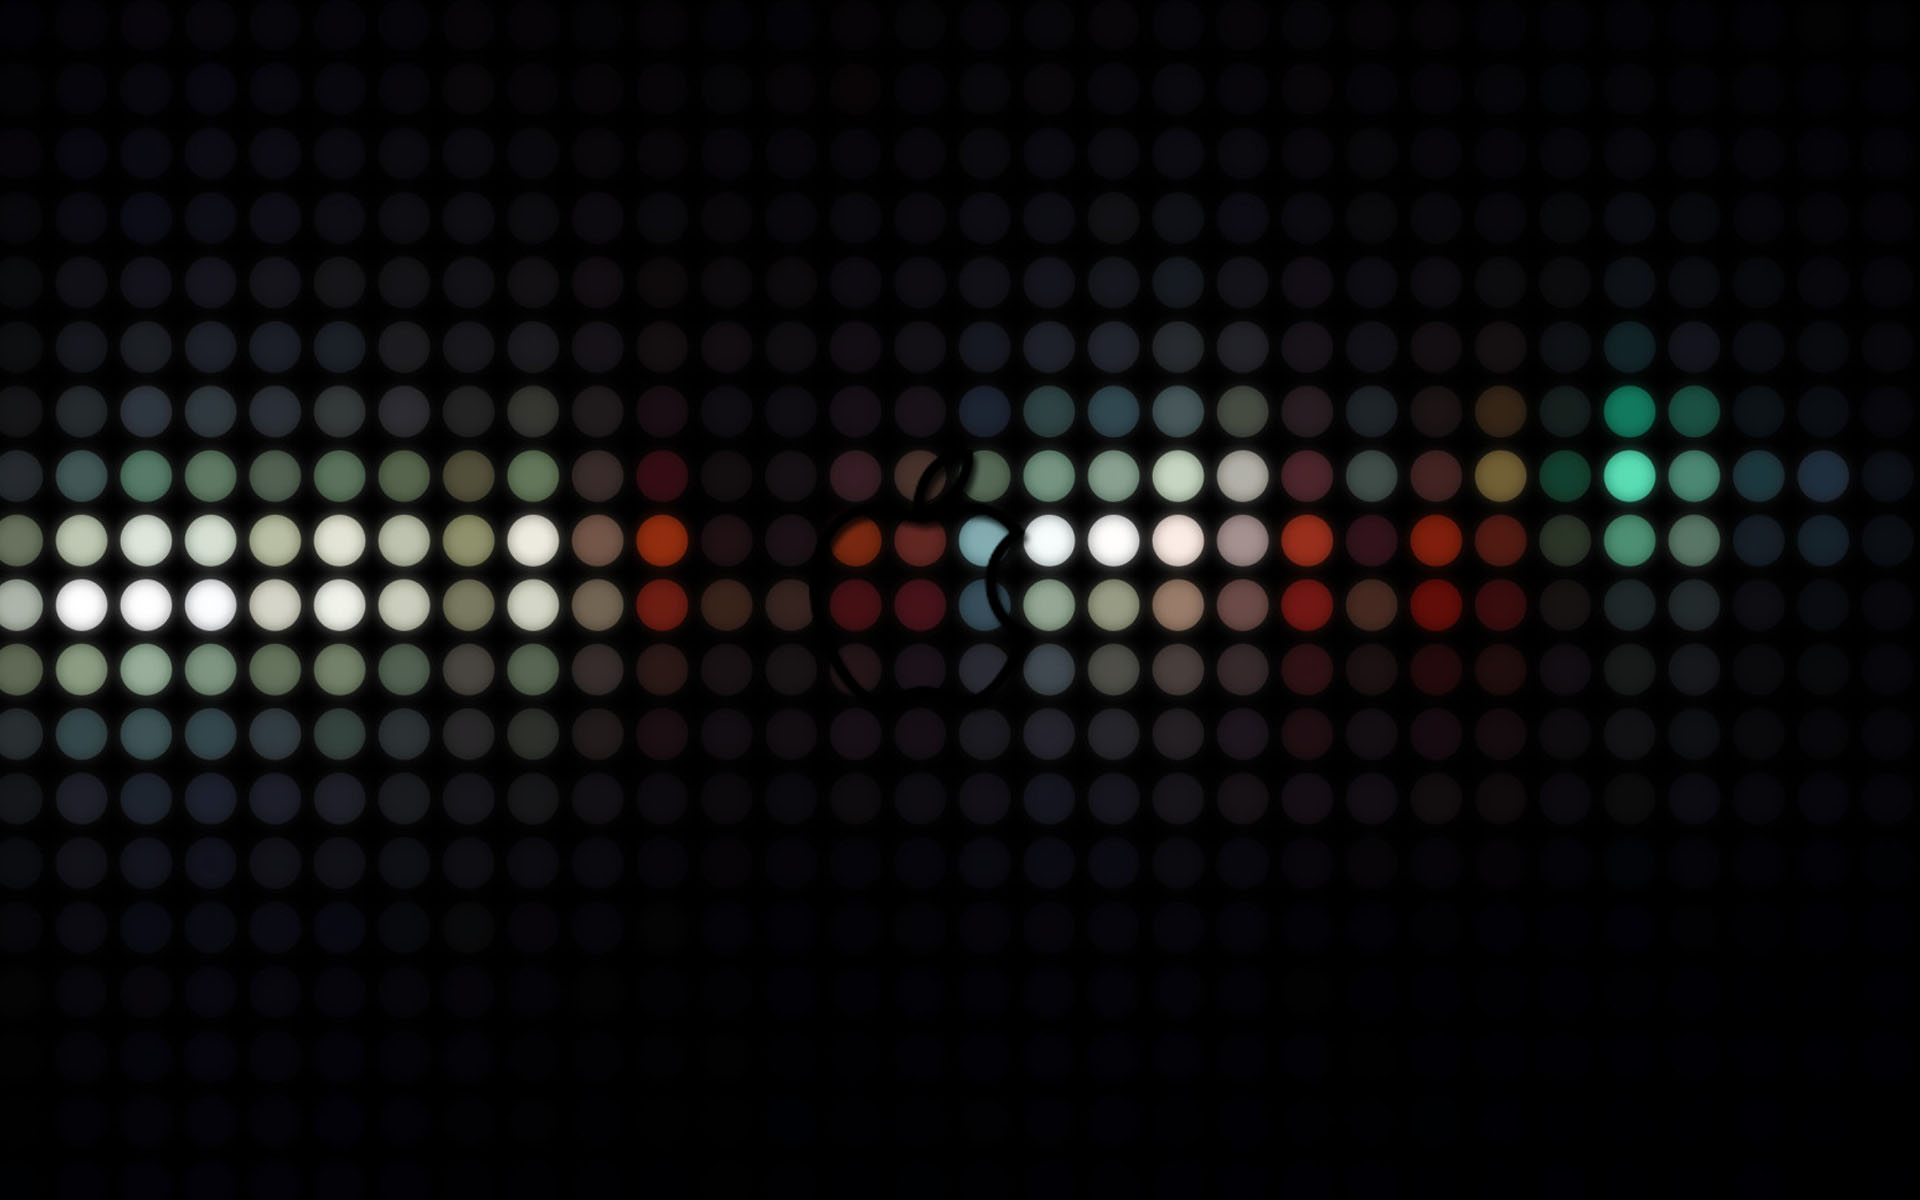 Disco Background wallpaper 149835 1920x1200